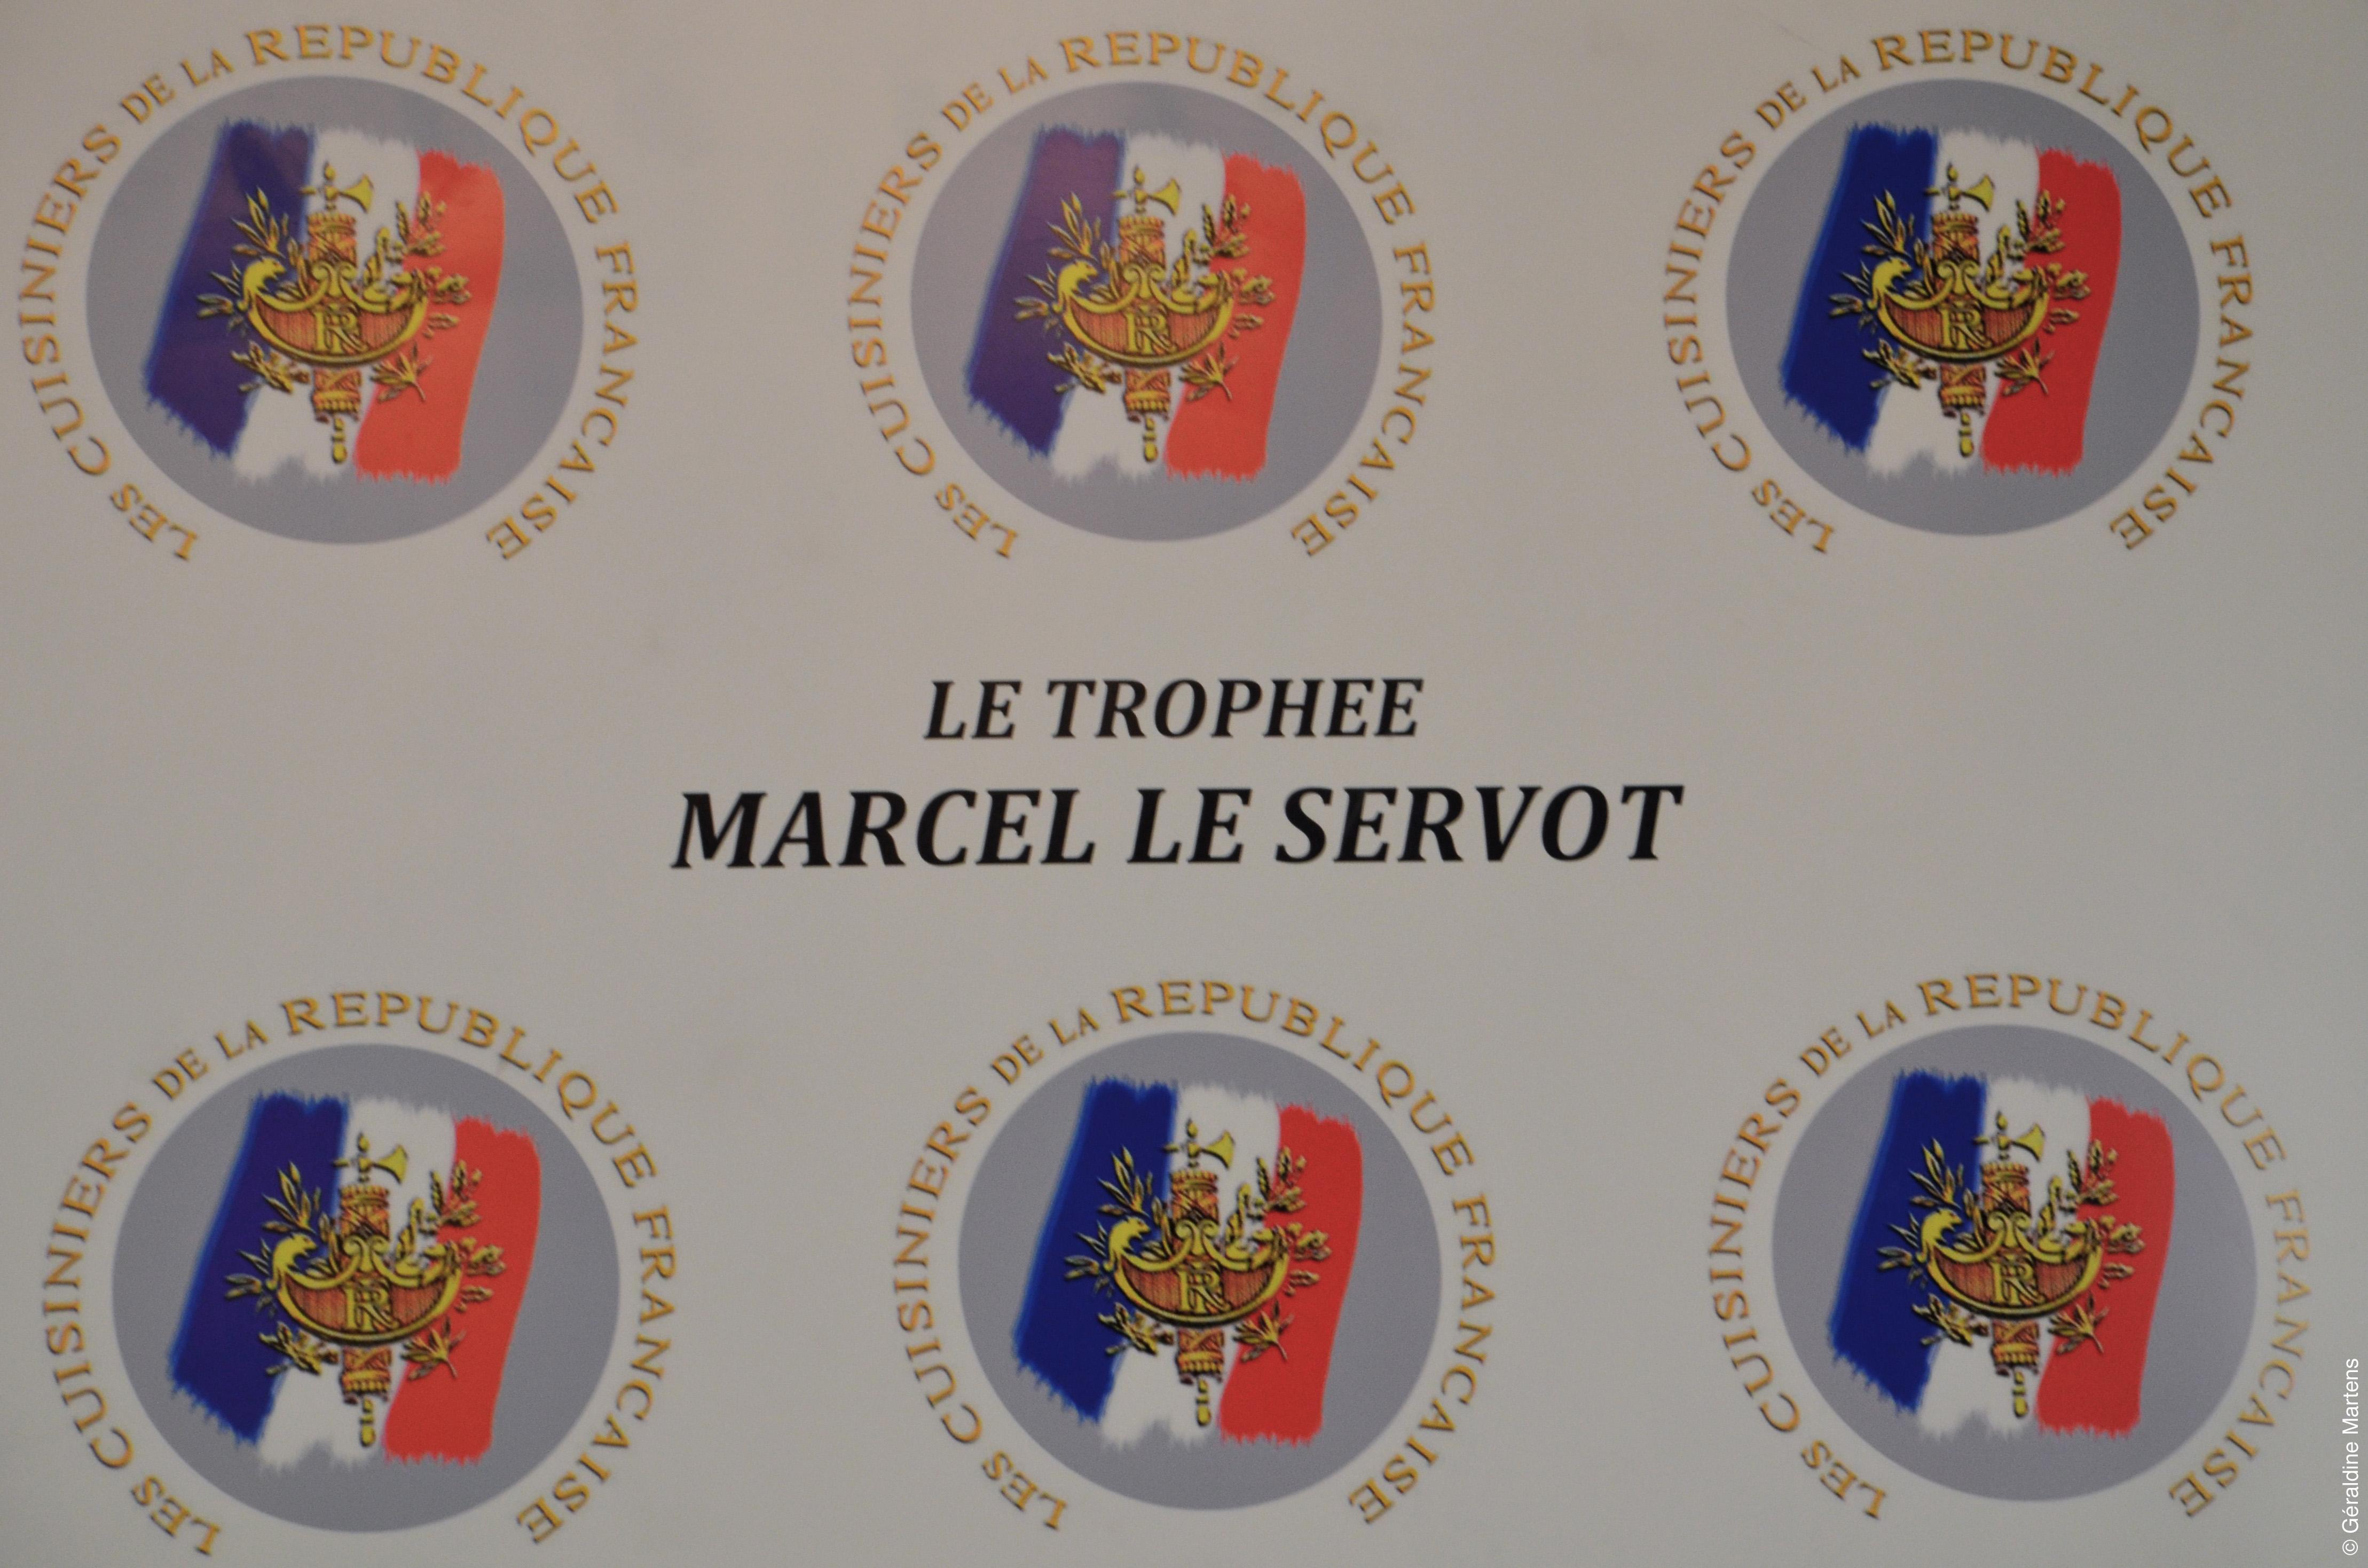 Remise Des Prix Du Troph U00e9e Marcel Le Servot  U00e0 L U2019h U00f4tel Marigny